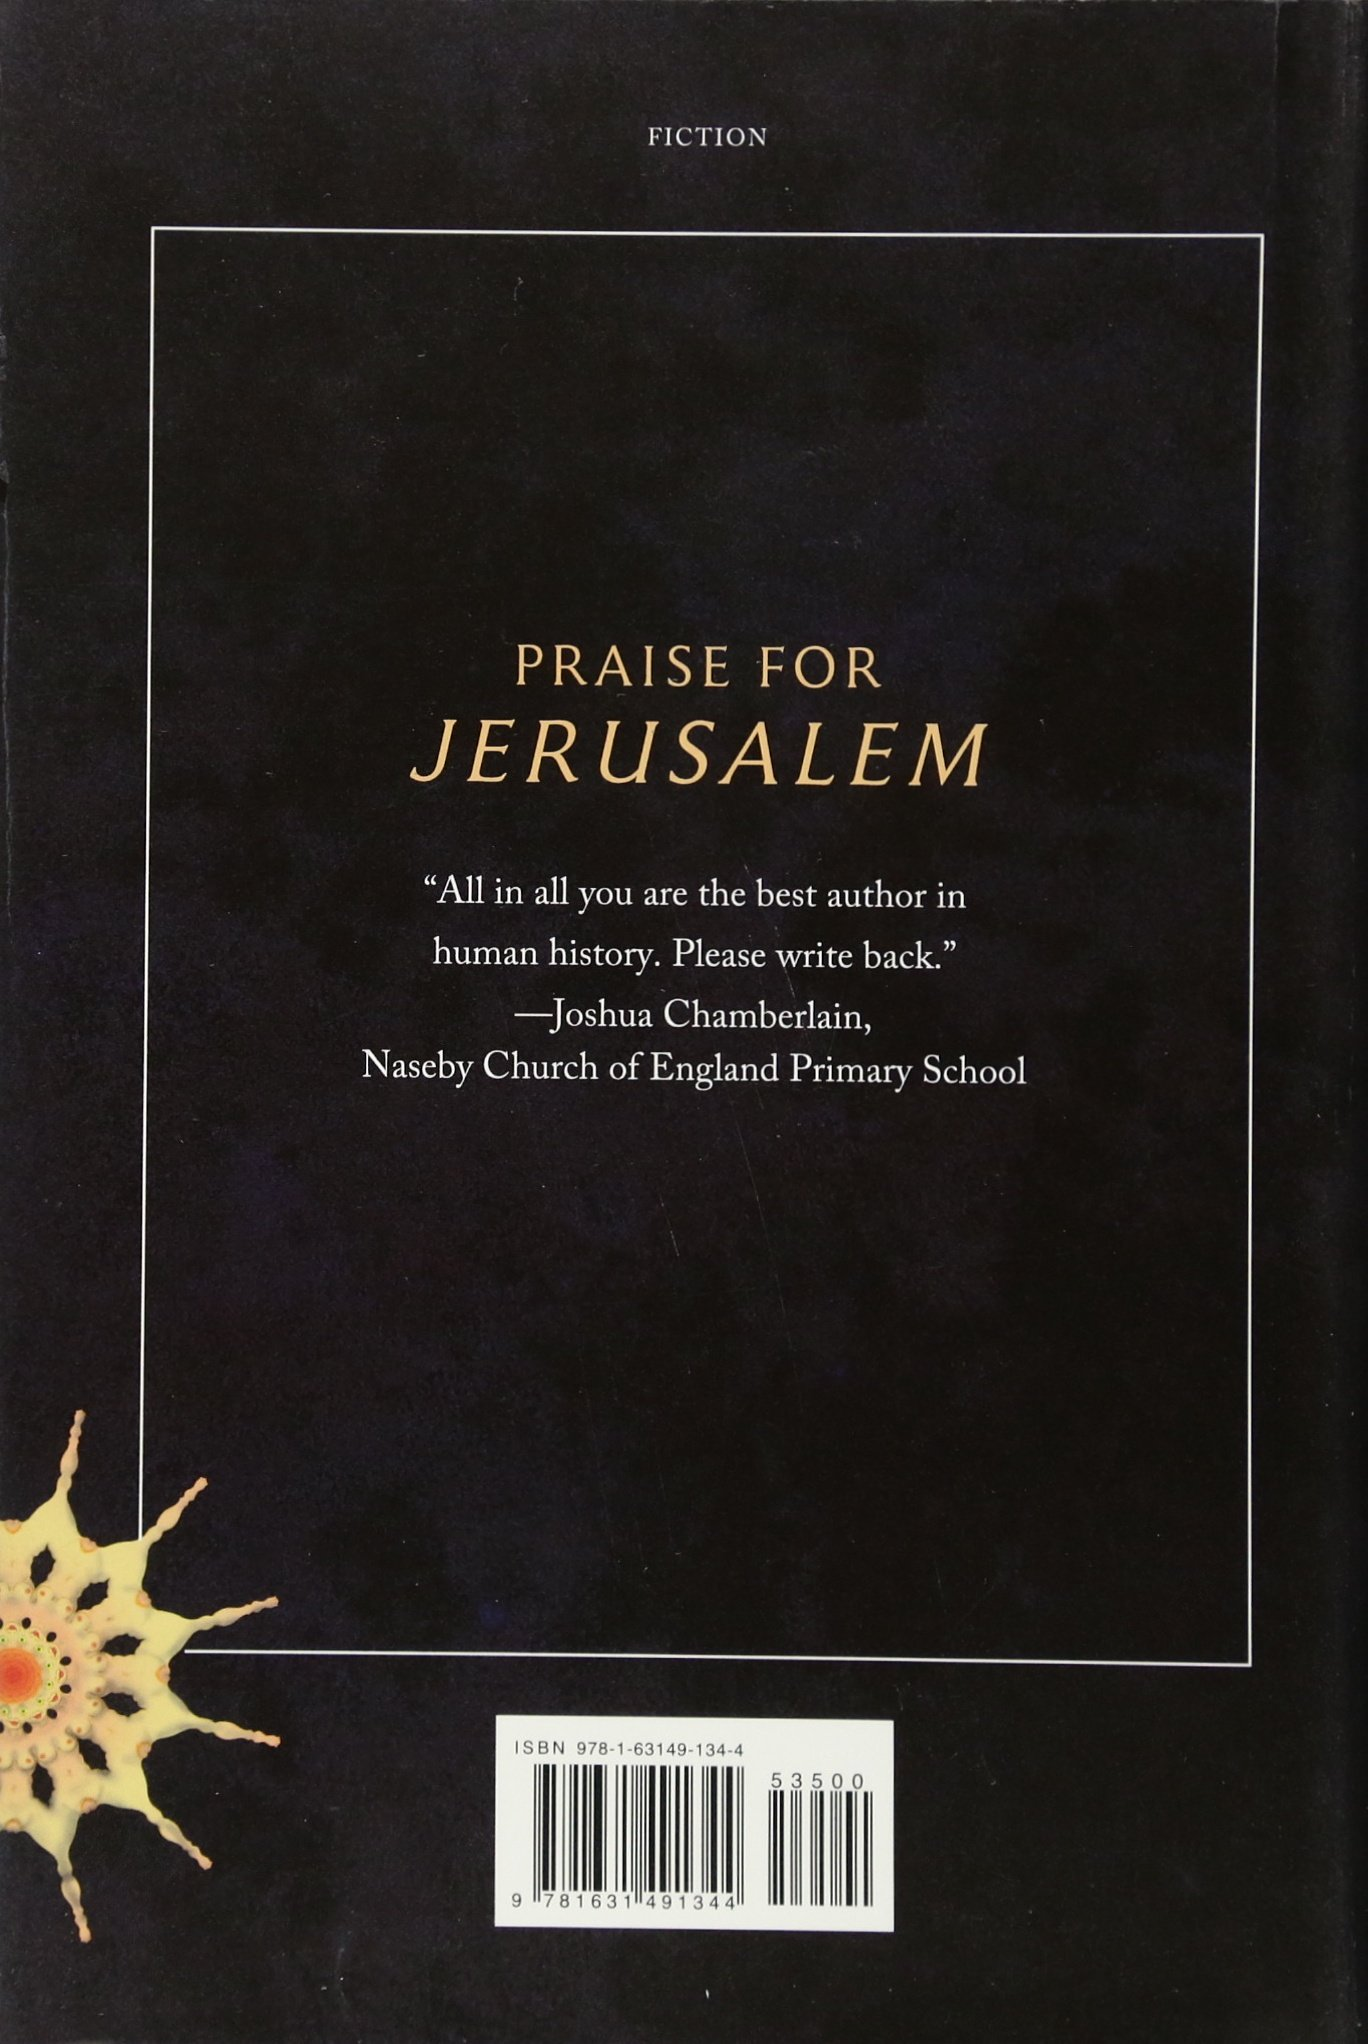 Jerusalem amazon alan moore 9781631491344 books fandeluxe Choice Image